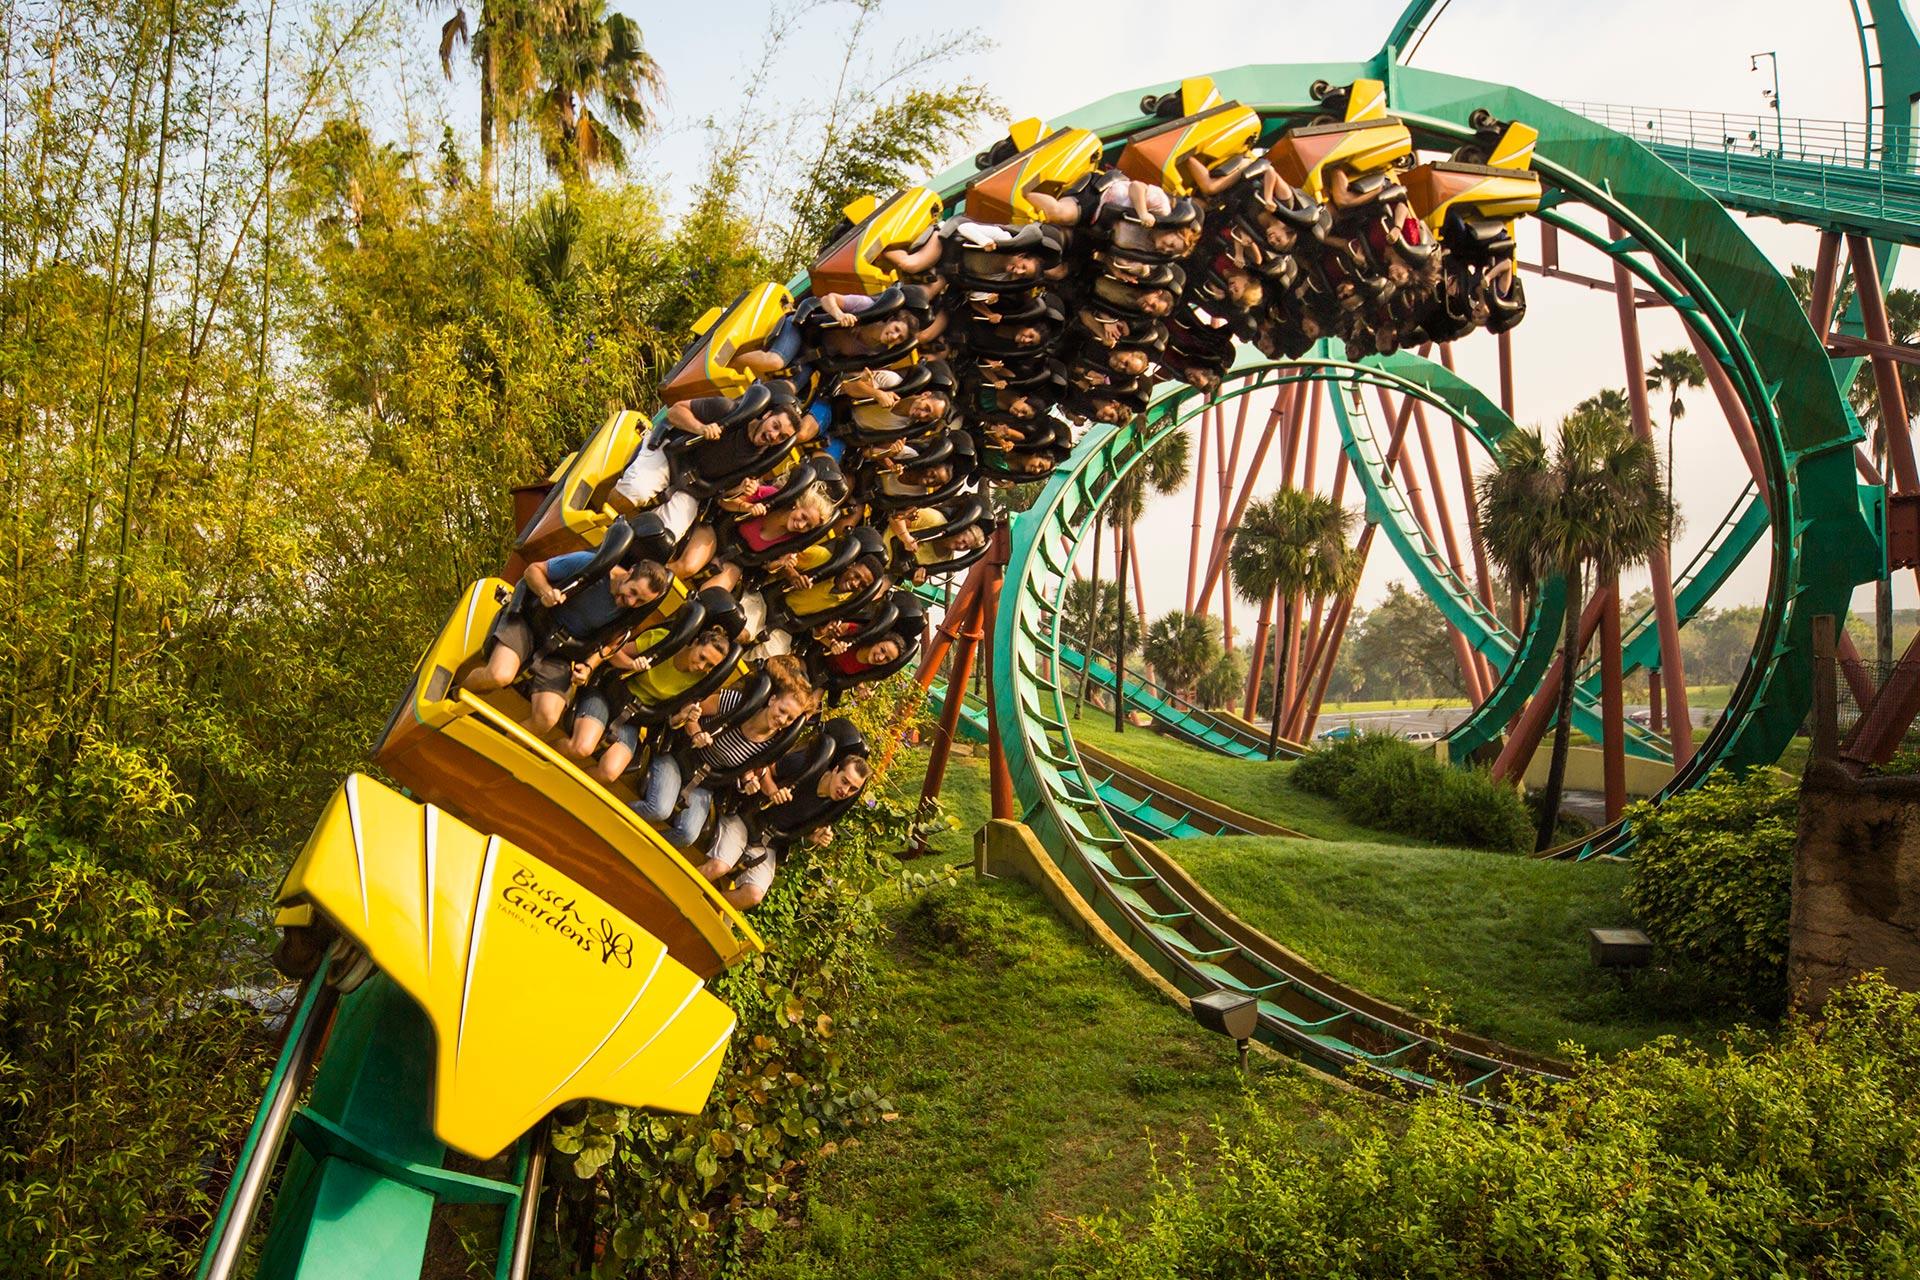 A ride at Busch Gardens Tampa Bay.